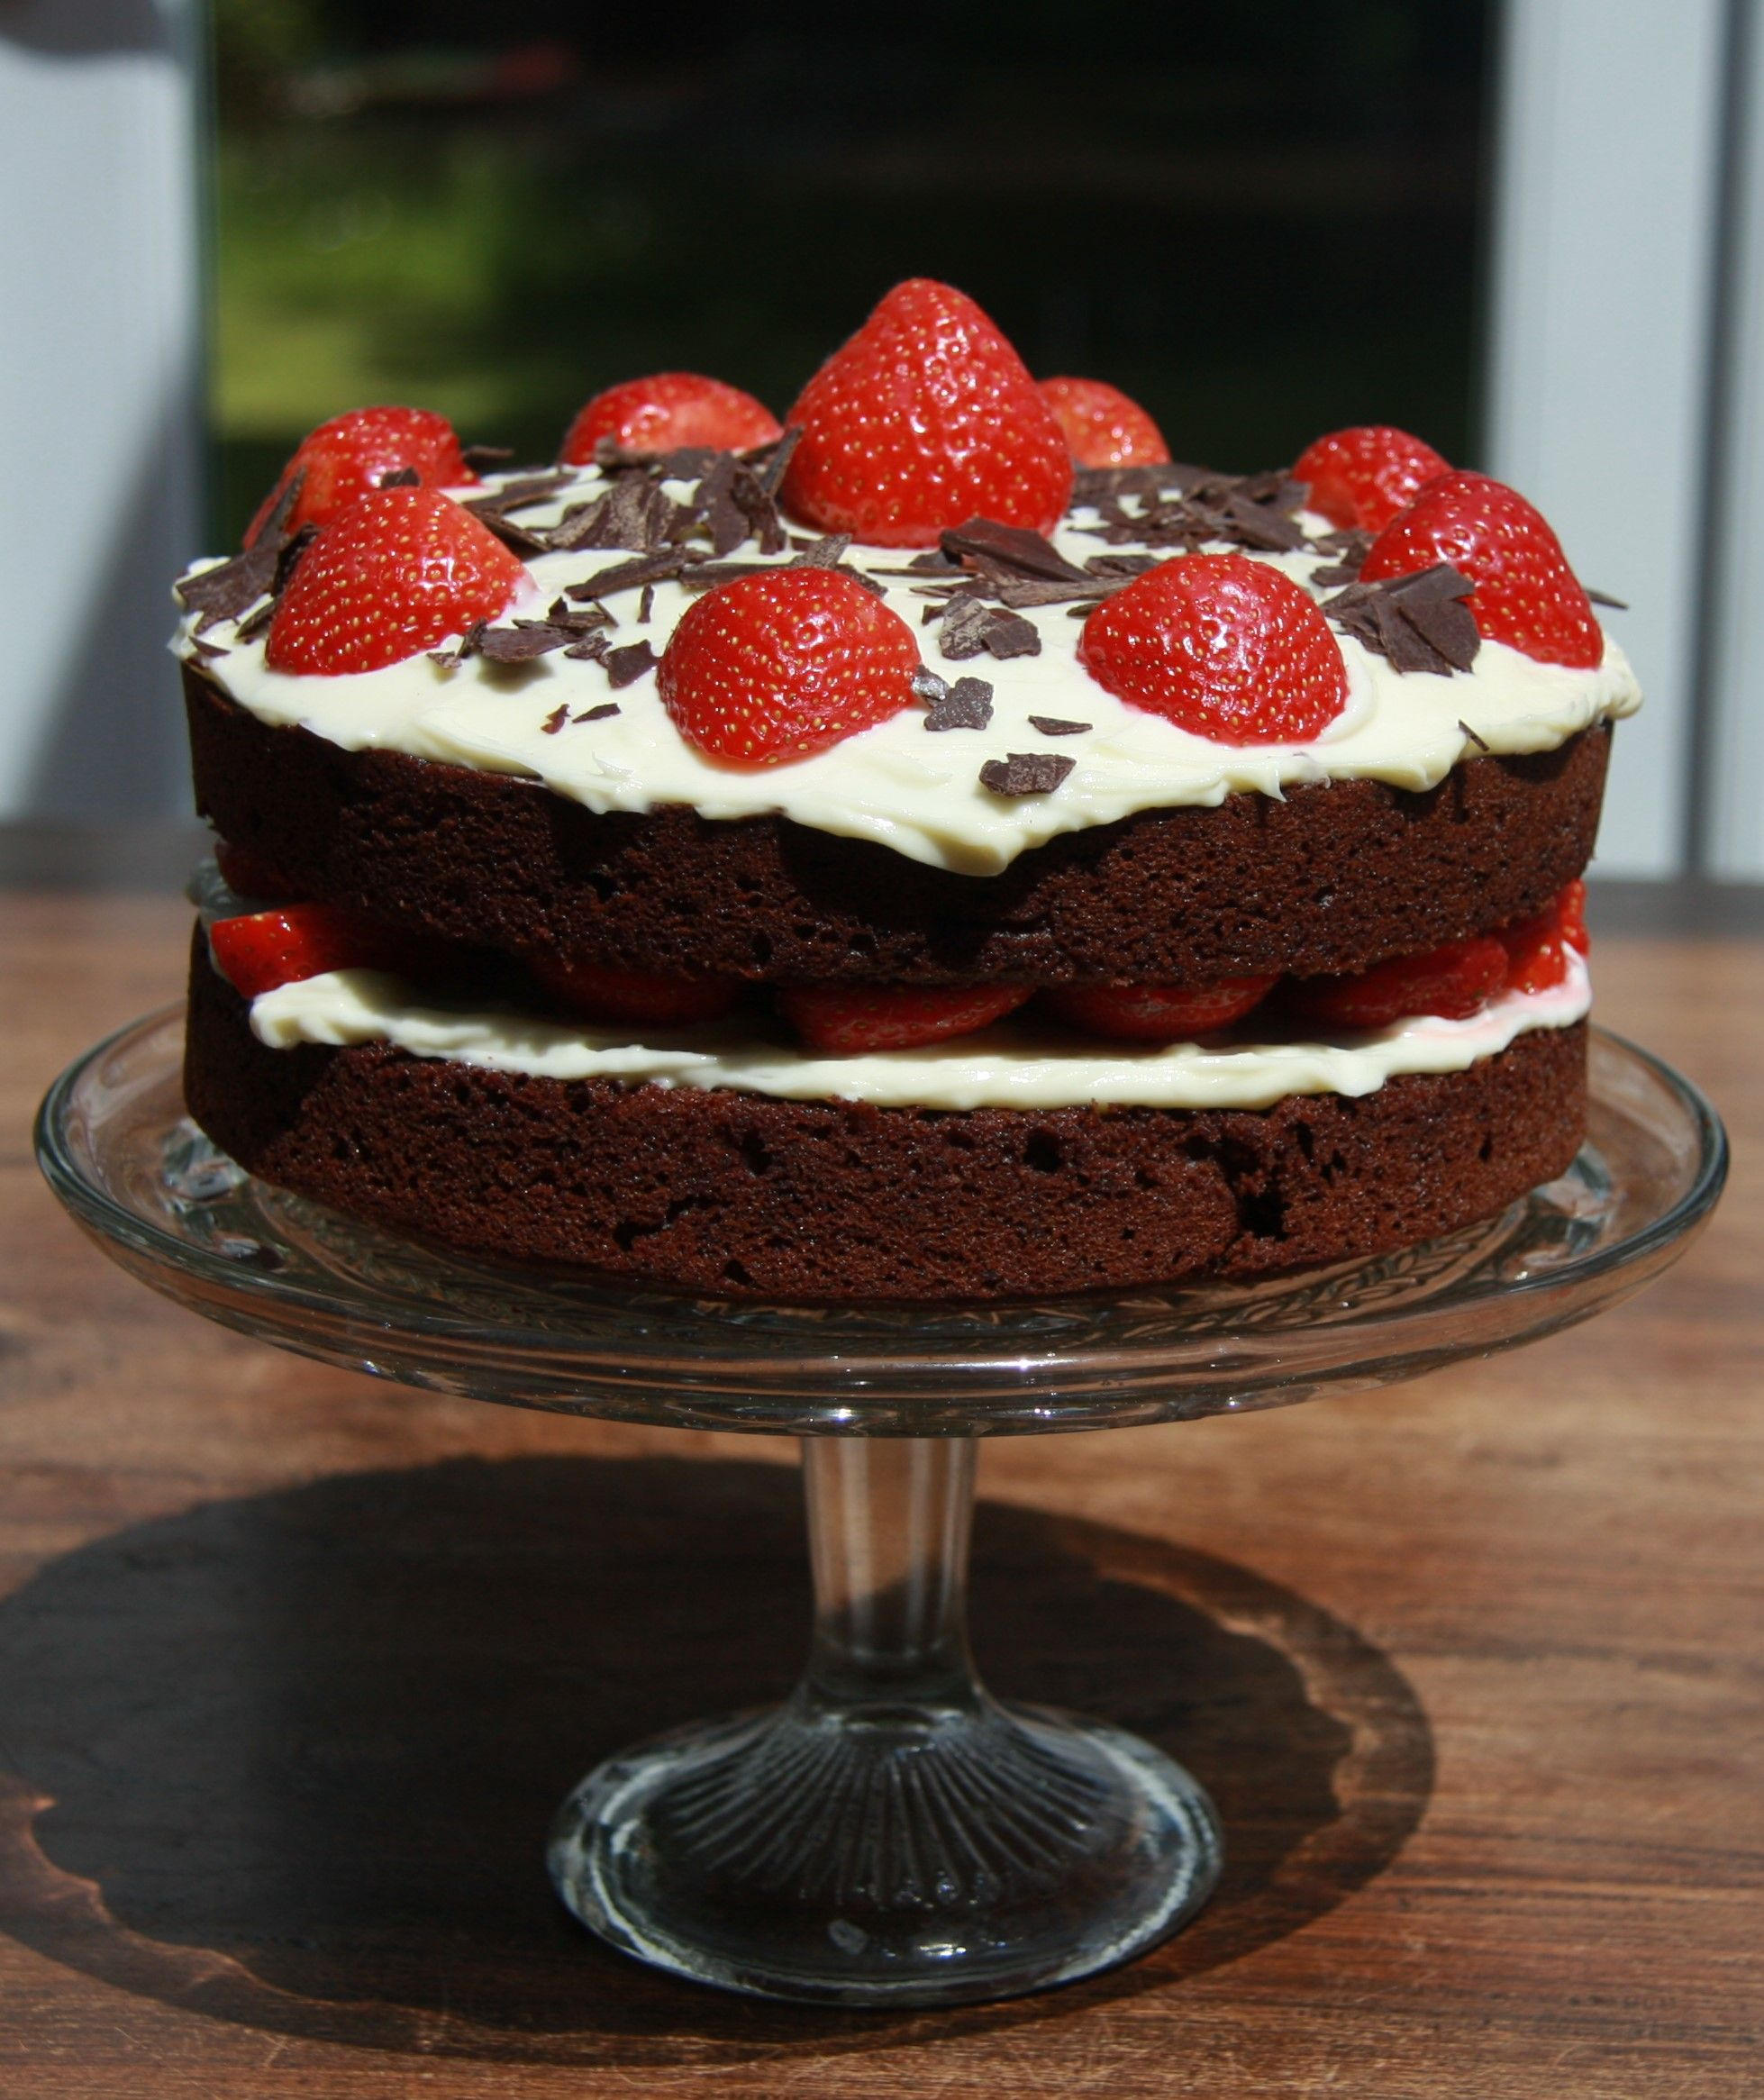 janaina cakes - Pesquisa Google